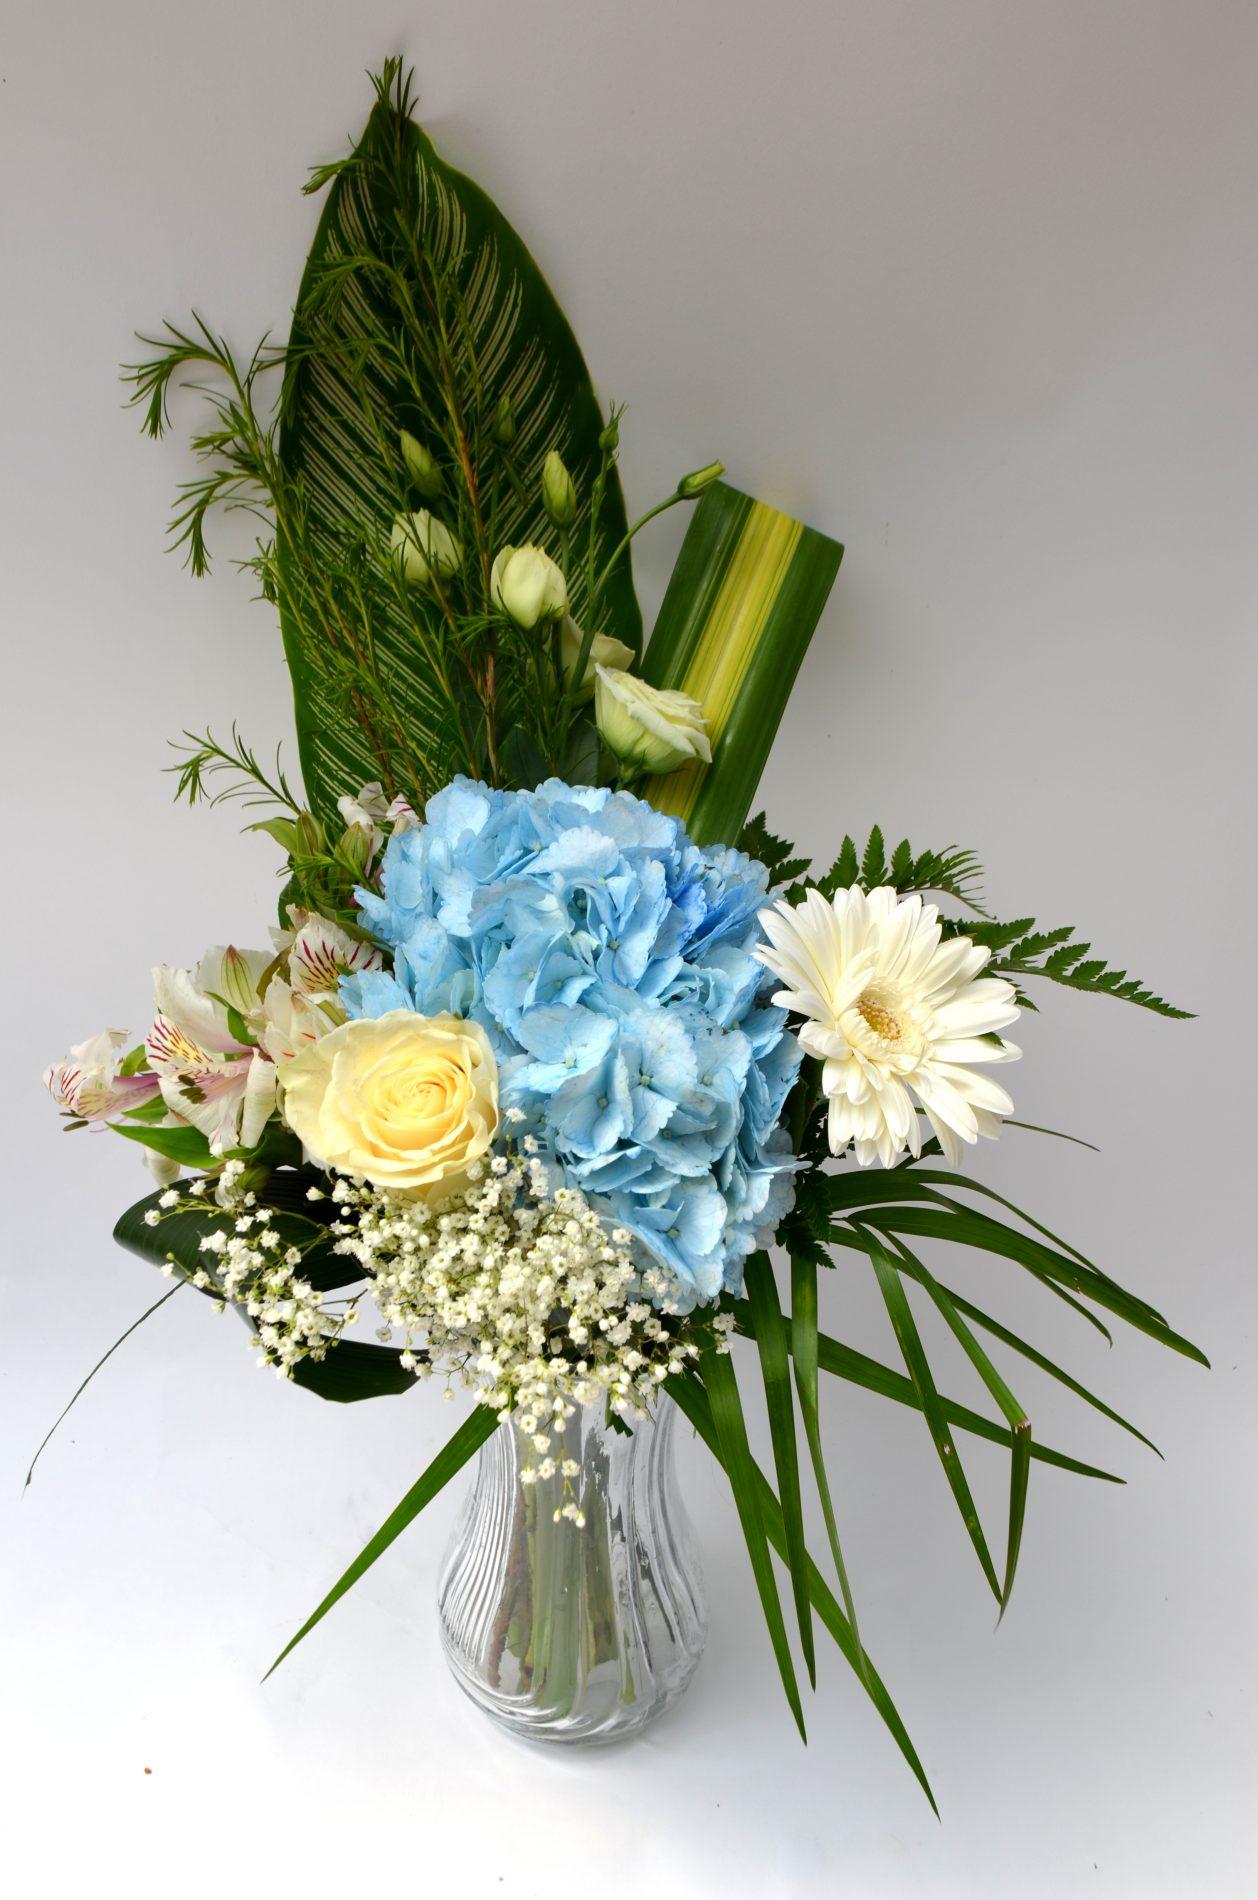 bouquet une touche de bleu, hydrangée, rose, gerbera, alstromeria, soupir de bebe